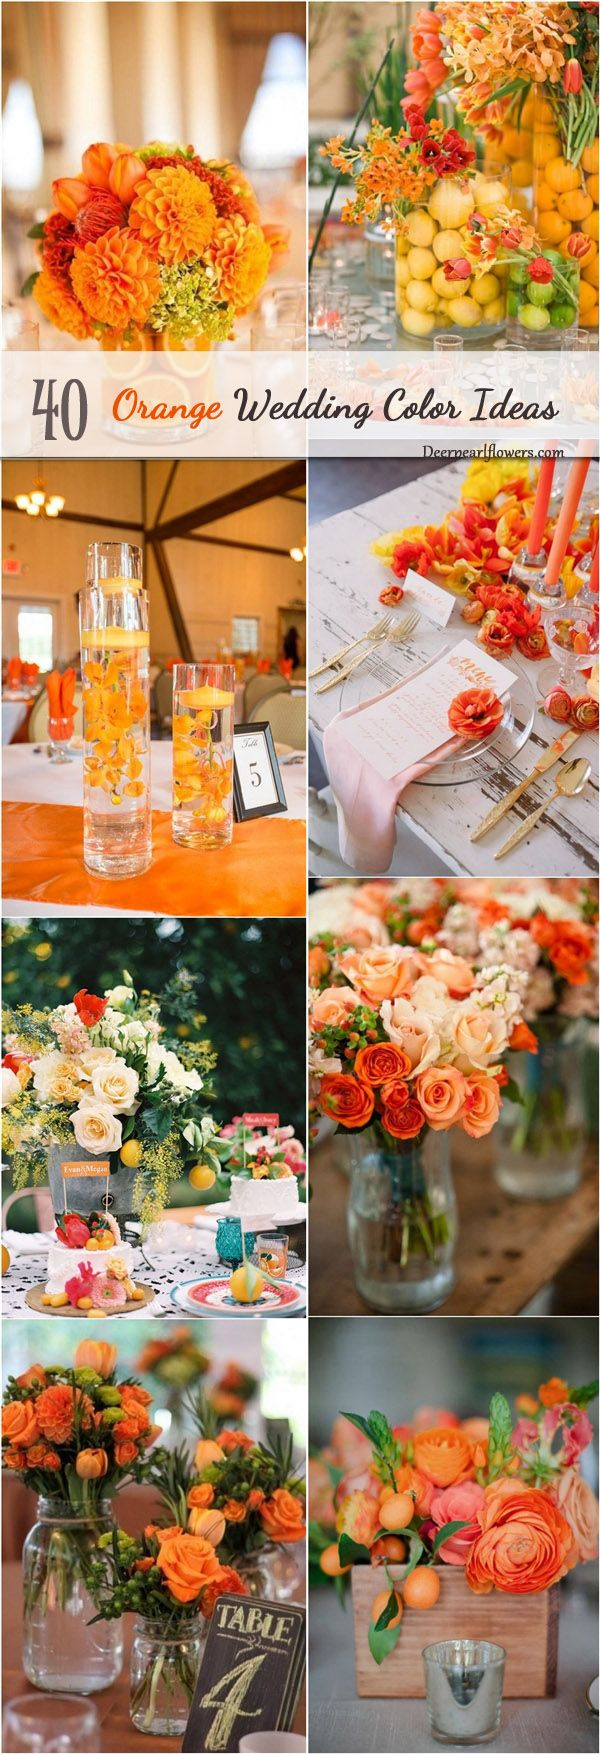 summer fall orange wedding color ideas / http://www.deerpearlflowers.com/orange-wedding-color-ideas/2/